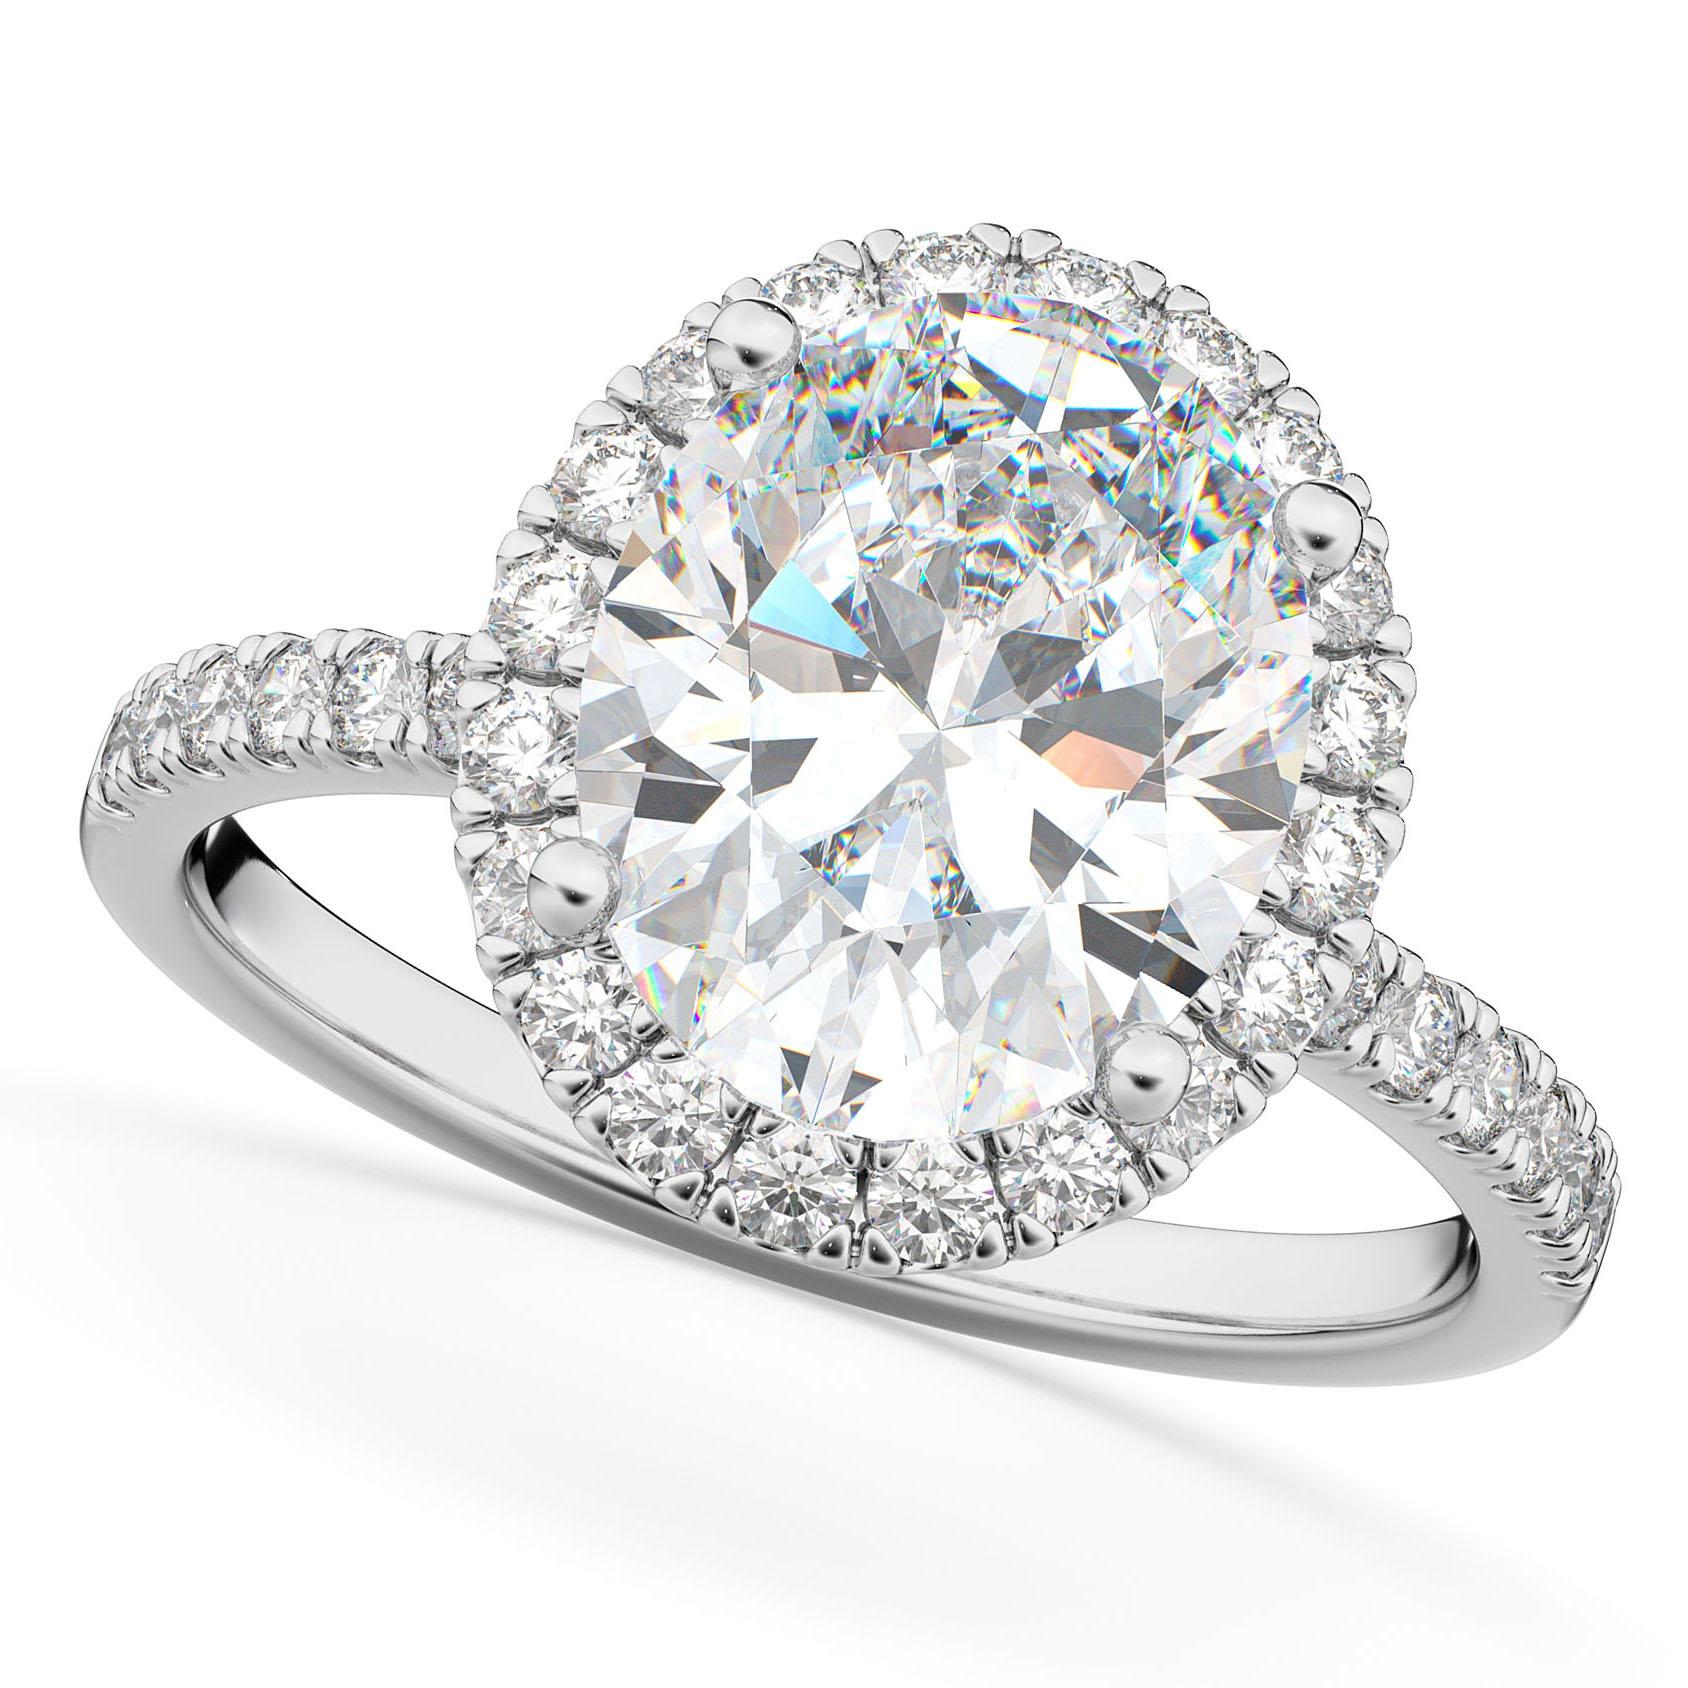 Oval Cut Halo Moissanite & Diamond Engagement Ring 14K White Gold 2.72ct